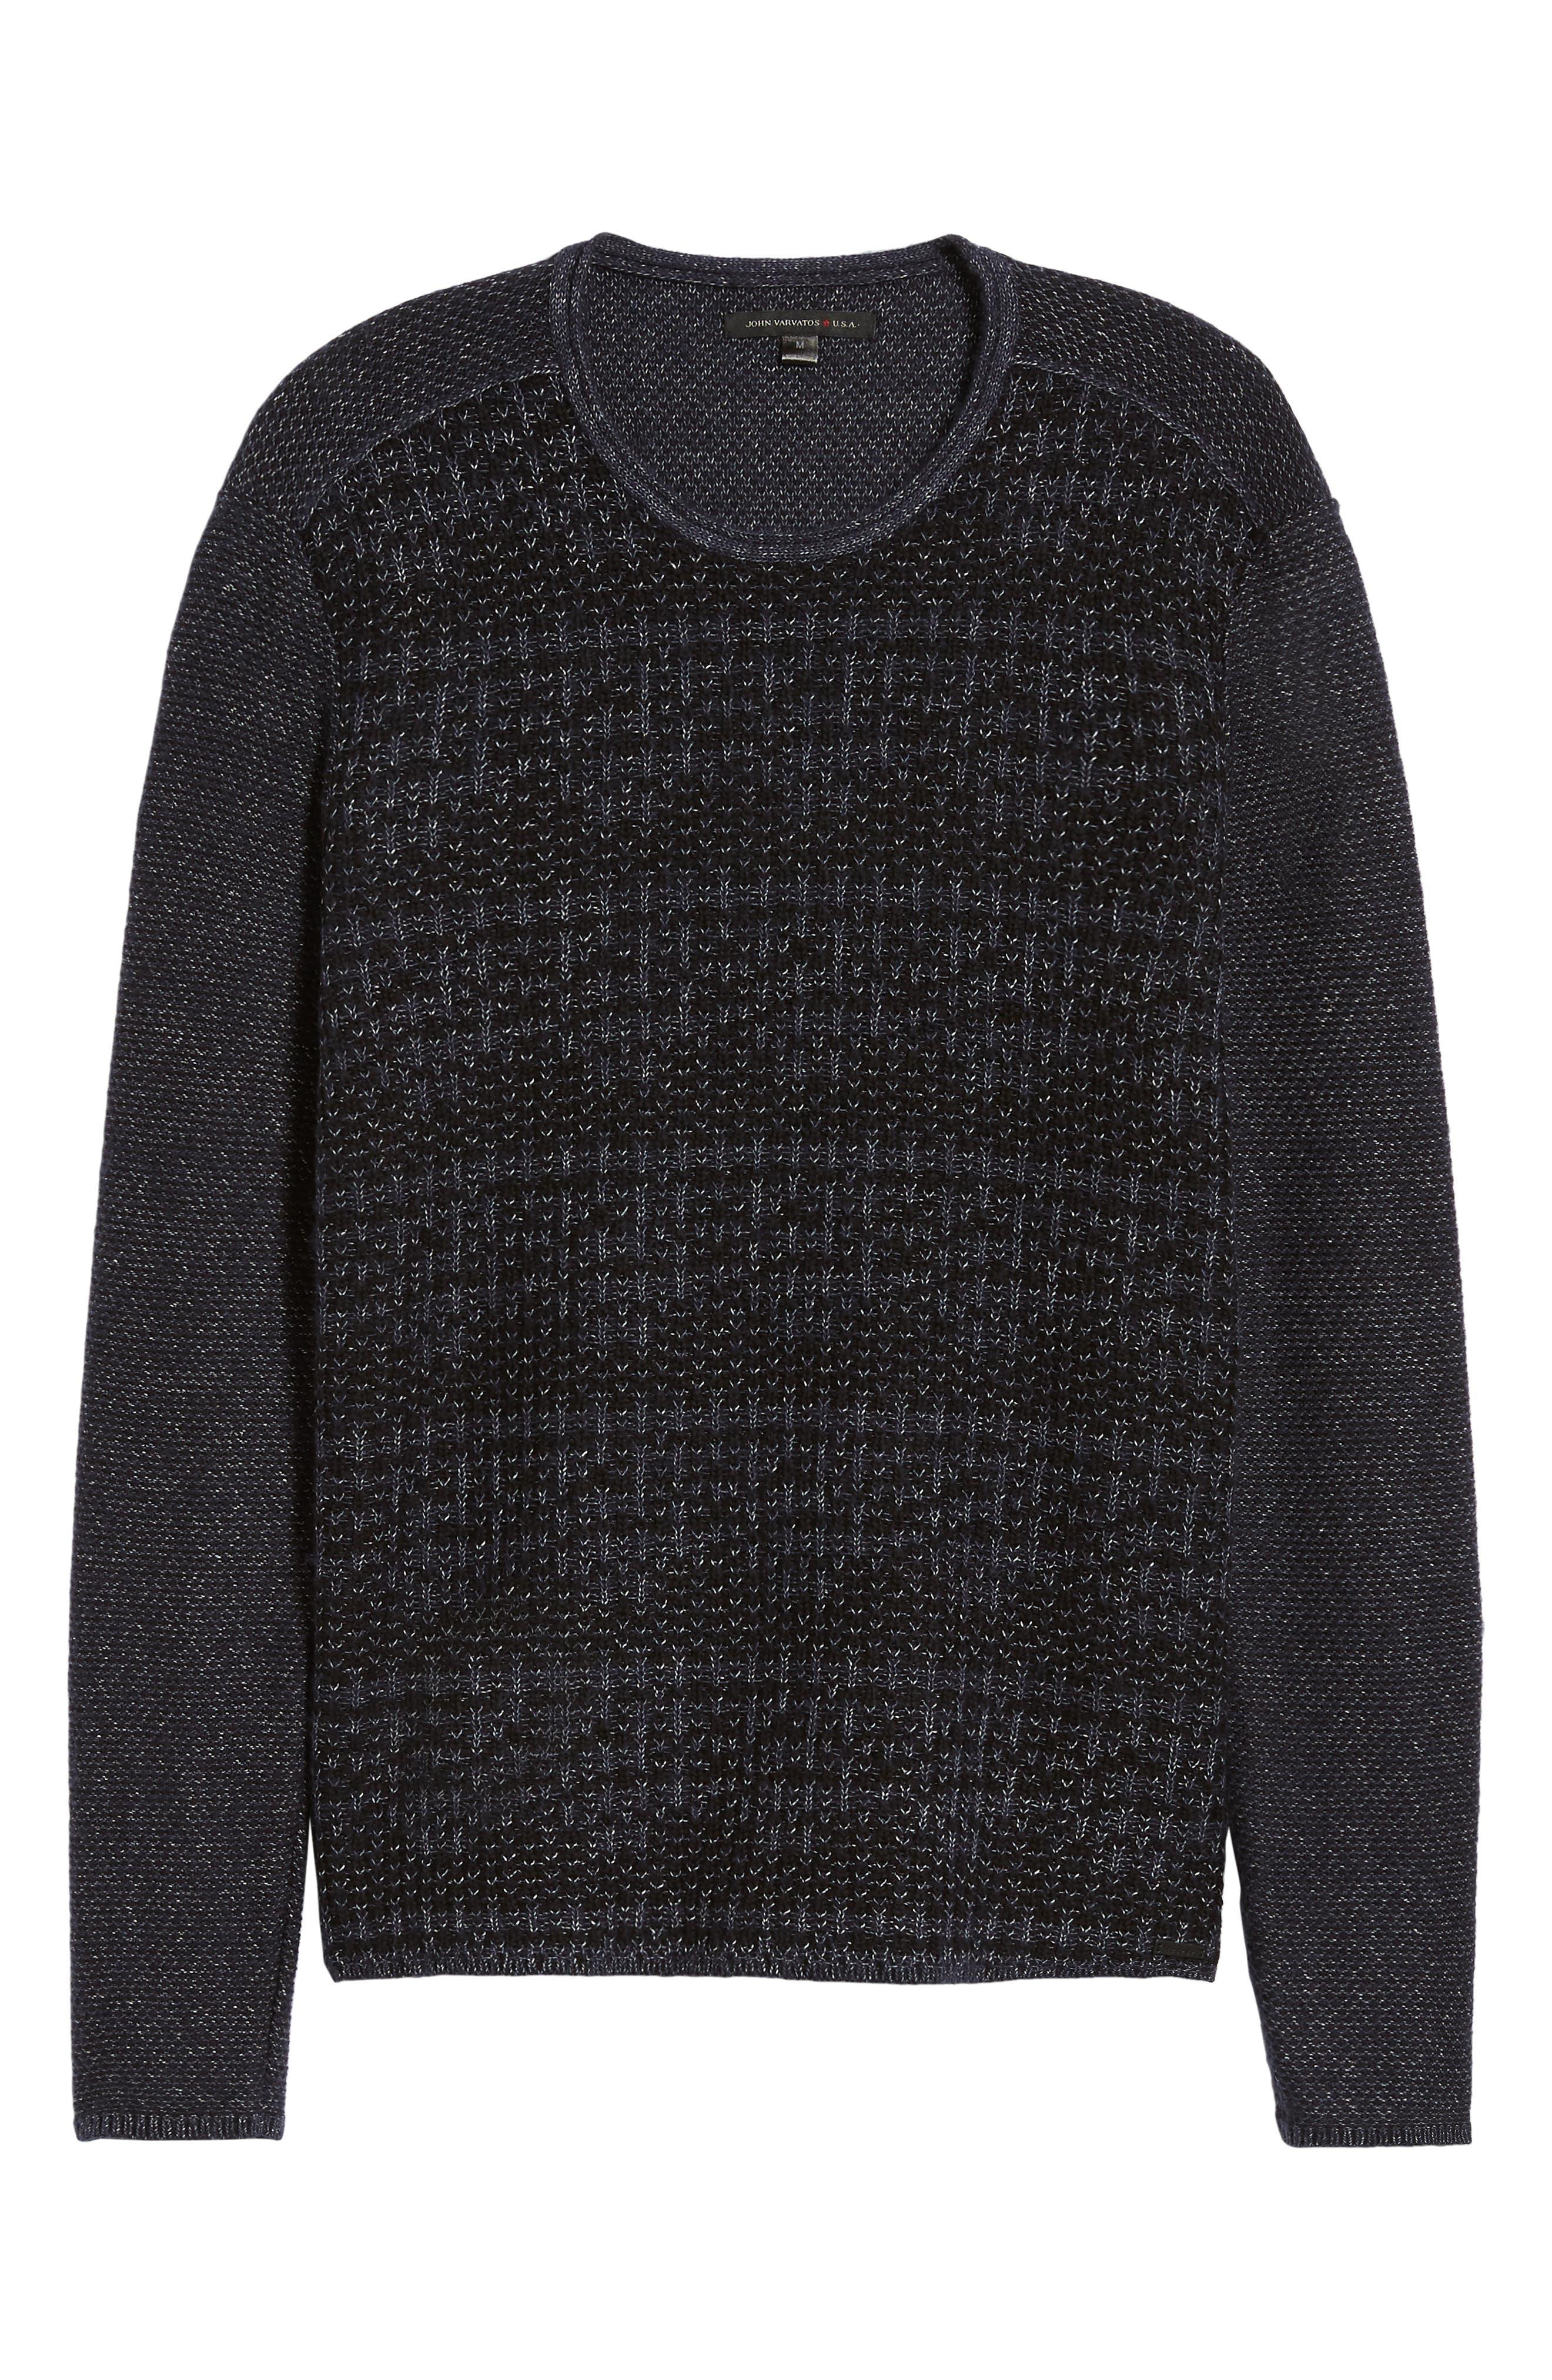 Mix Stitch Regular Fit Cotton Blend Sweater,                             Alternate thumbnail 6, color,                             INK BLUE